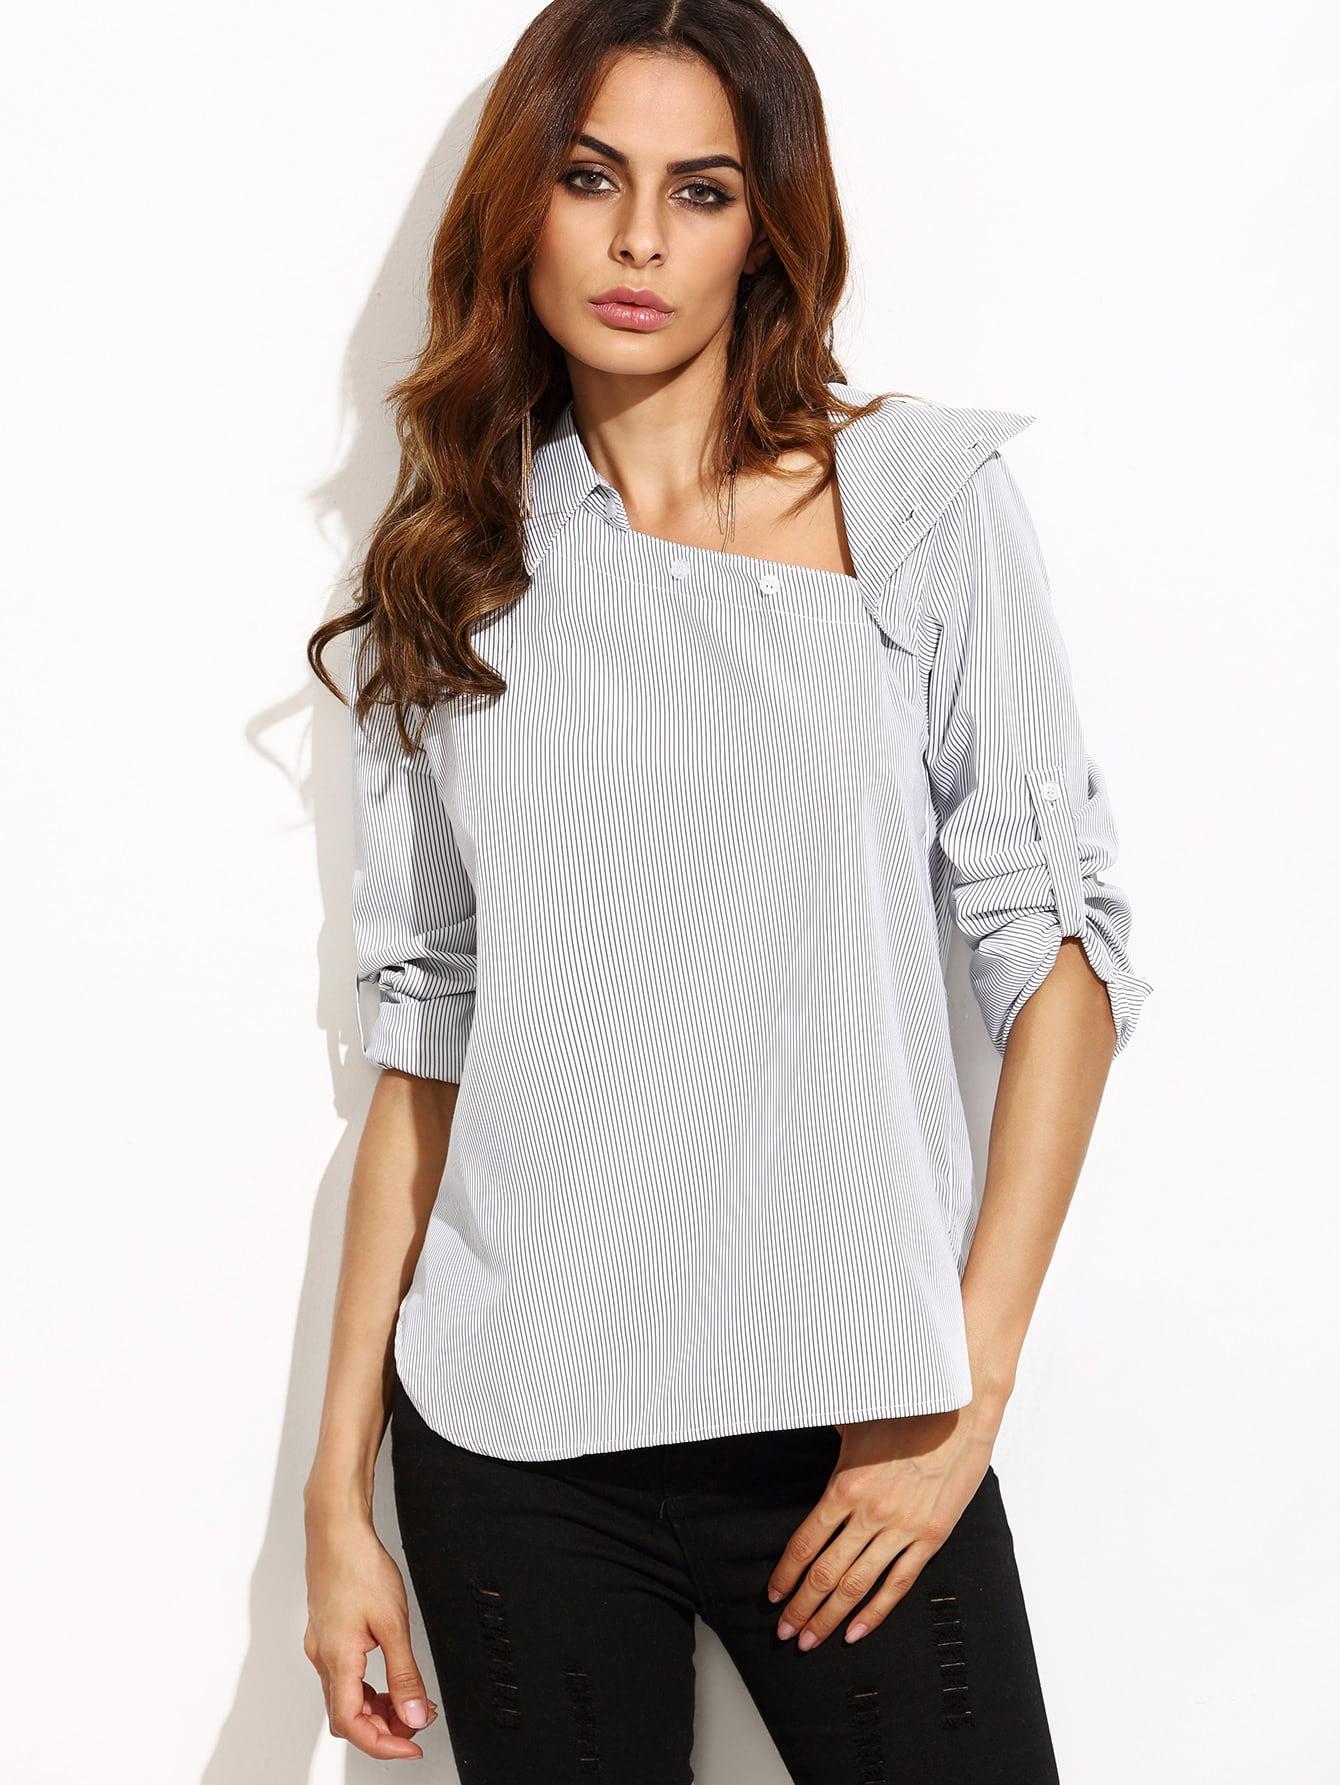 Striped Asymmetric Buttoned Neck Blouse striped asymmetric buttoned neck blouse